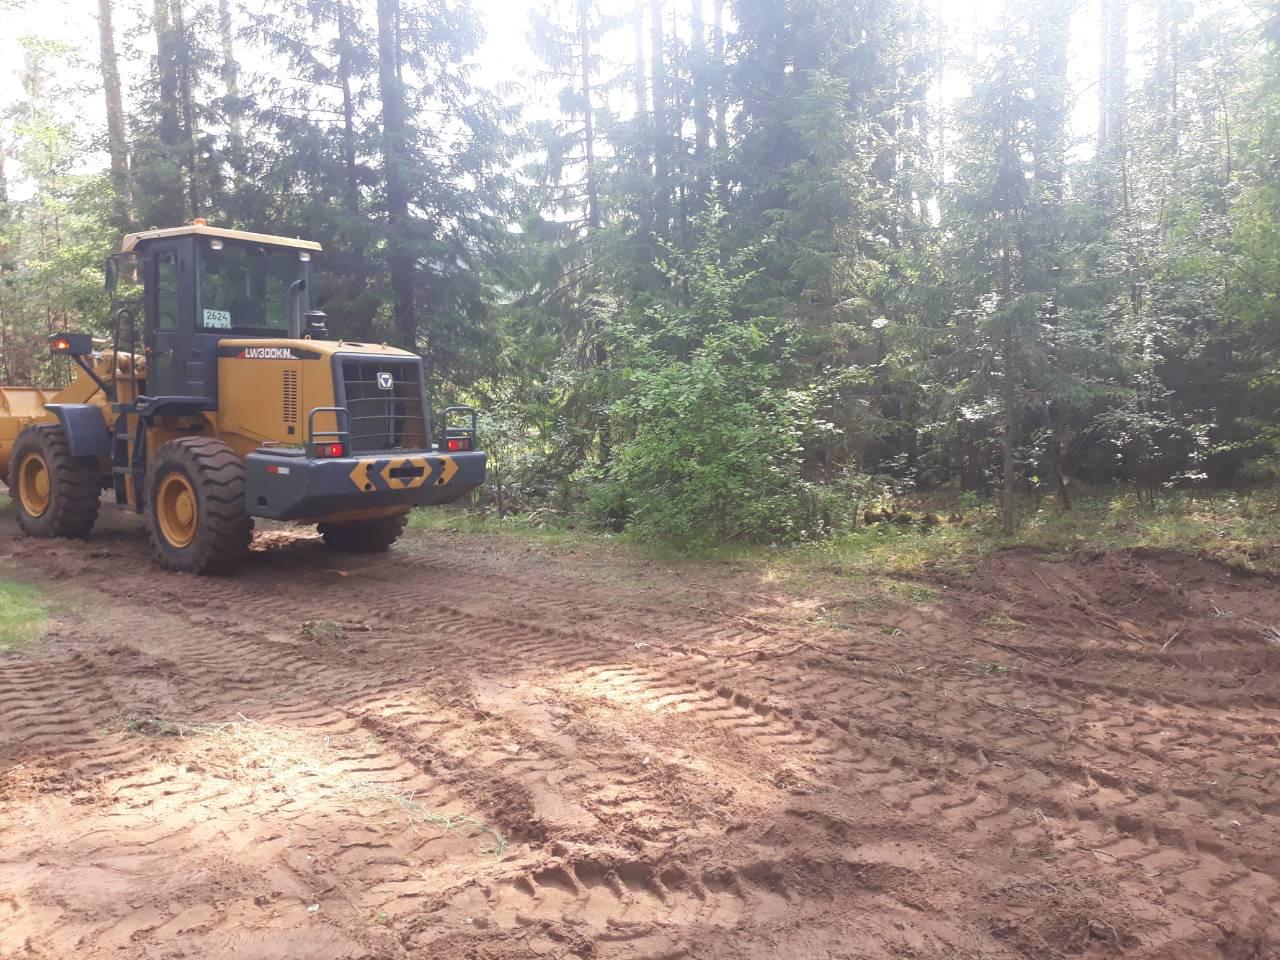 битумная лужа в лесу, 2018 год